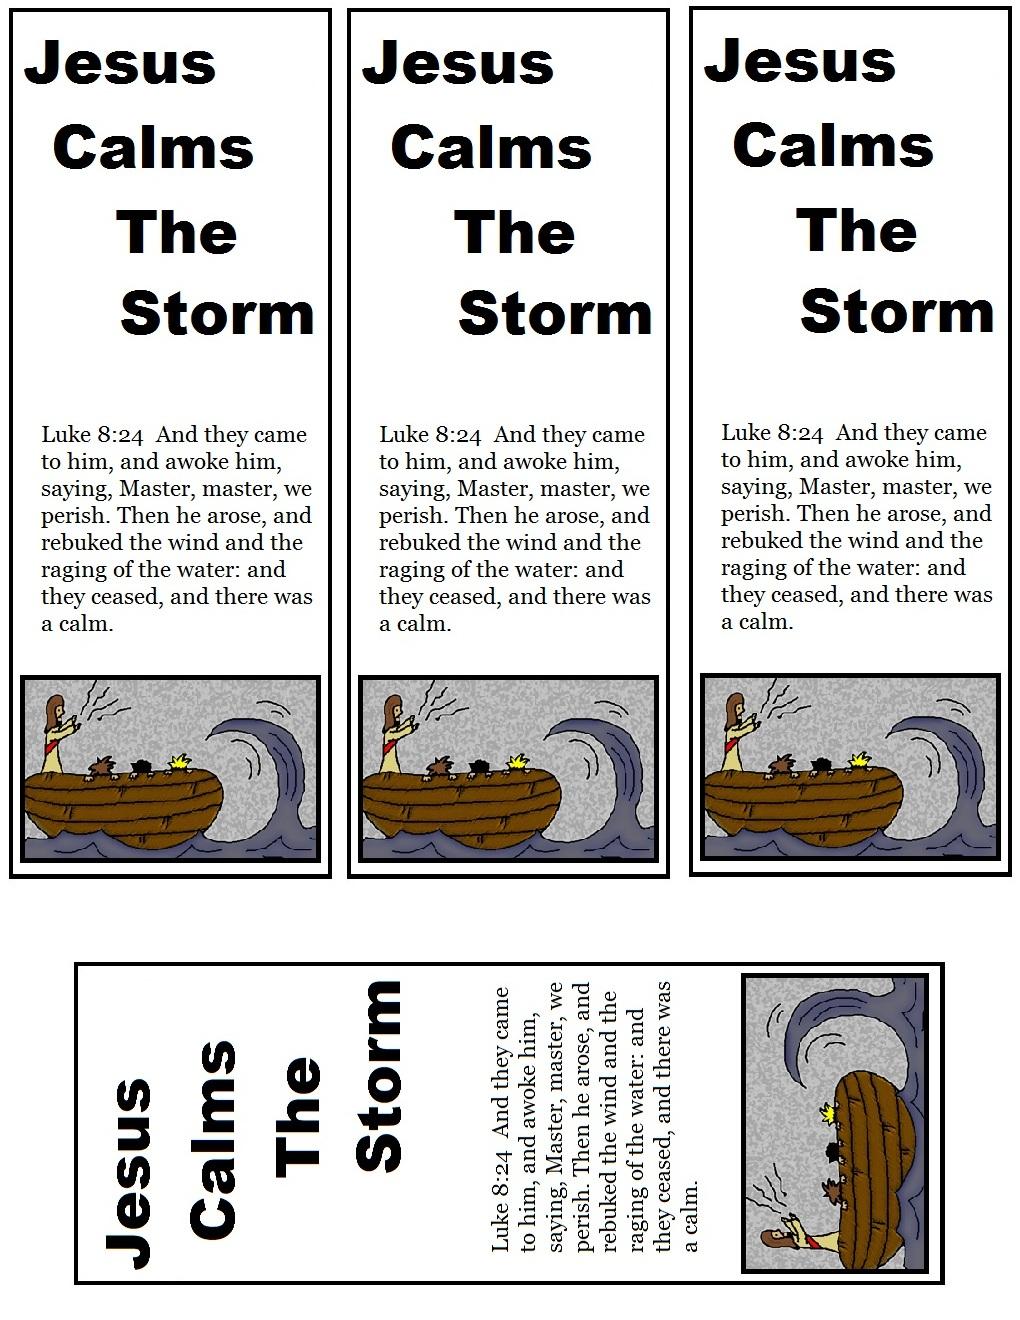 Jesus Calms The Storm Sunday School